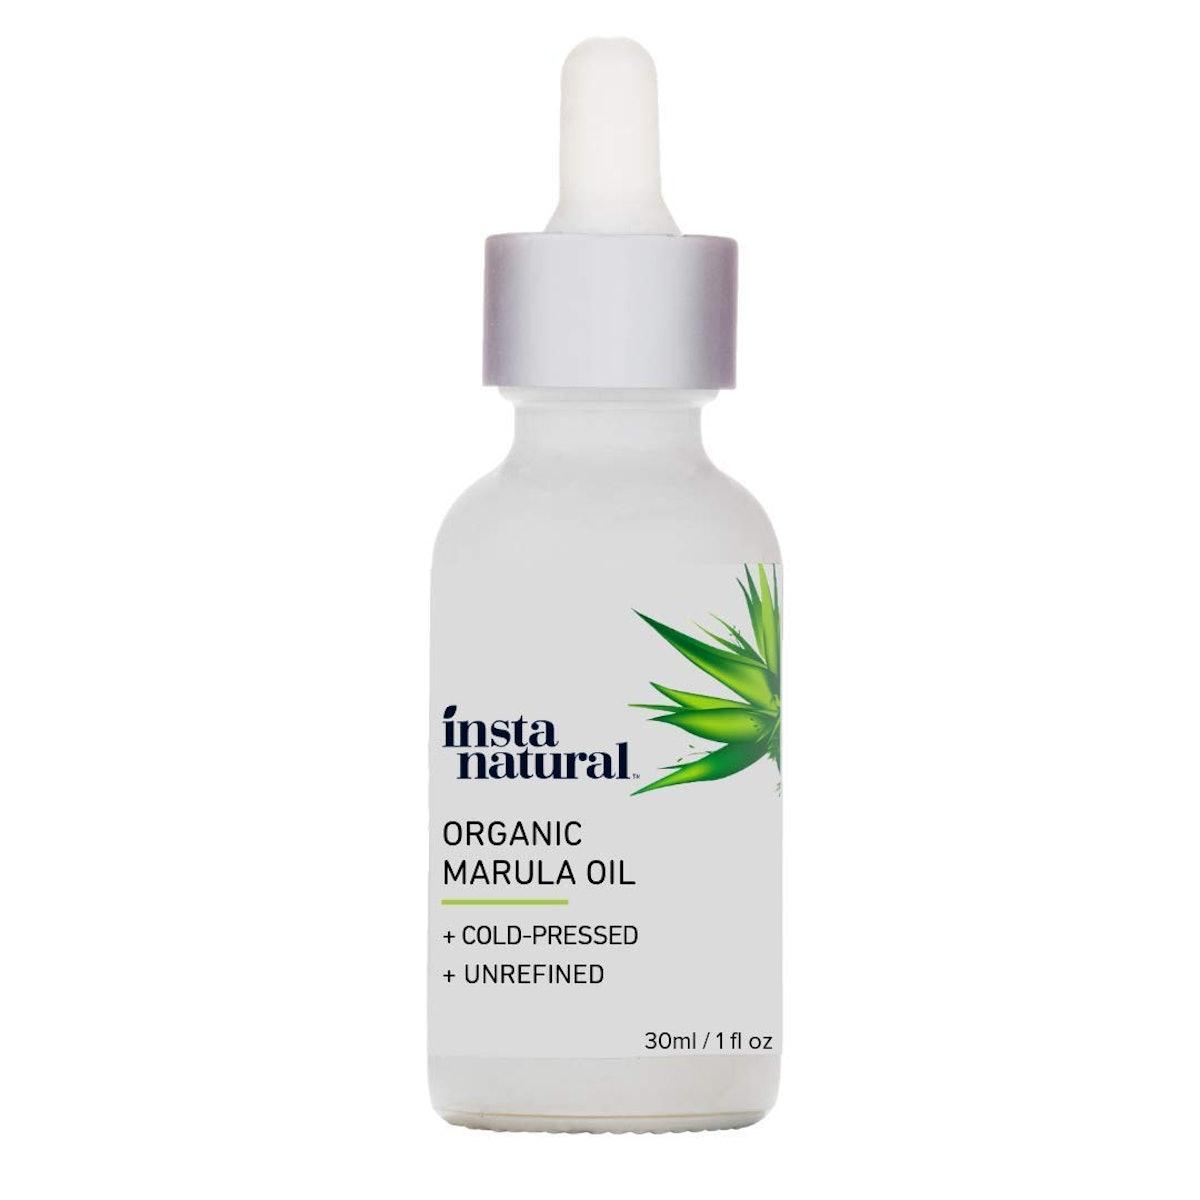 InstaNatural Organic Marula Oil